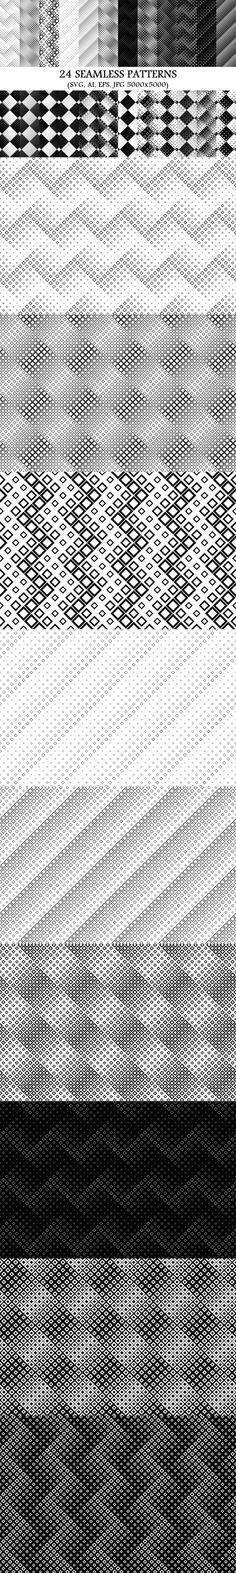 24 Seamless Square Patterns #BackgroundSets #PremiumBackground #pattern #BackgroundGraphics #BackgroundSet #SeamlessPatterns #BackgroundCollections #DiscountPattern #monochromepattern #GeometricGraphics #PatternCollection #BackgroundGraphic #CheapVectorGraphics #PatternBundles #PatternCollections #pattern #PatternDesign #geometry #BackgroundSets